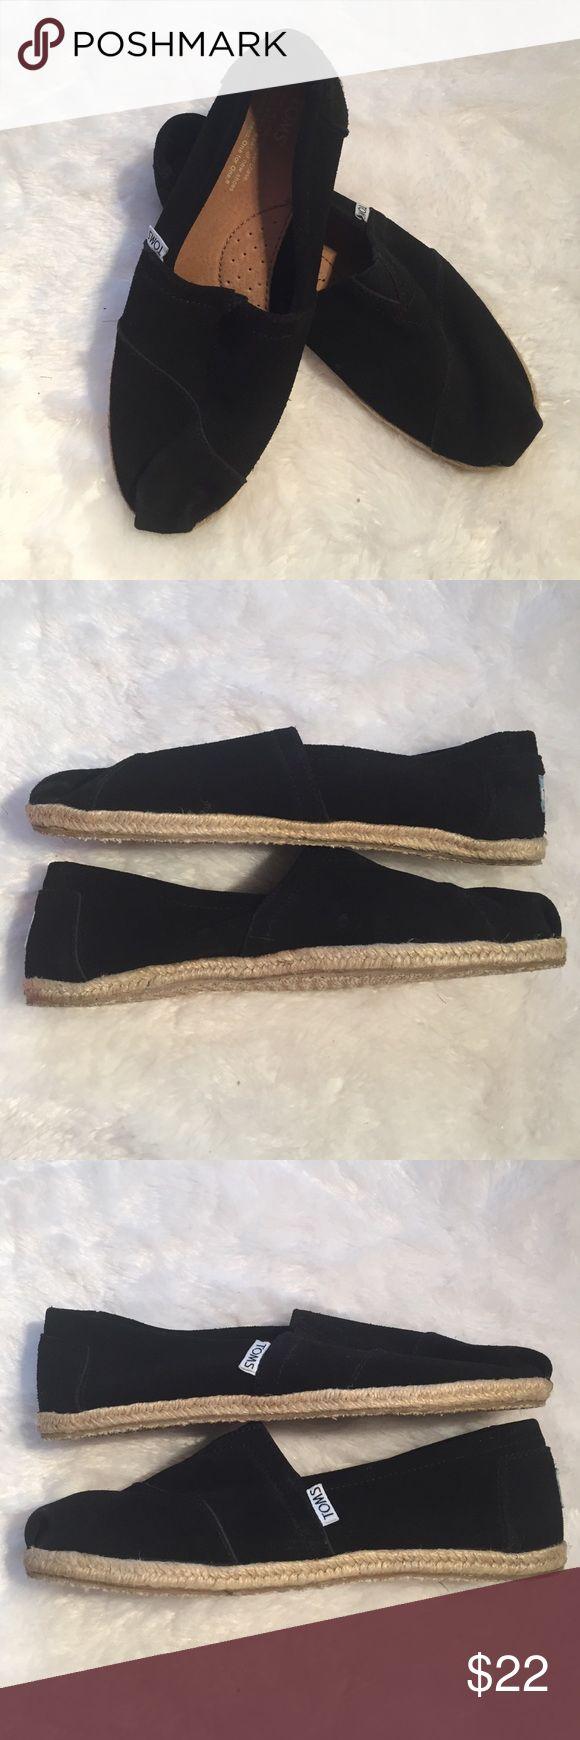 〰Women's toms 8.5 Suede〰 Women's 8.5 toms Suede black excellent condition TOMS Shoes Flats & Loafers